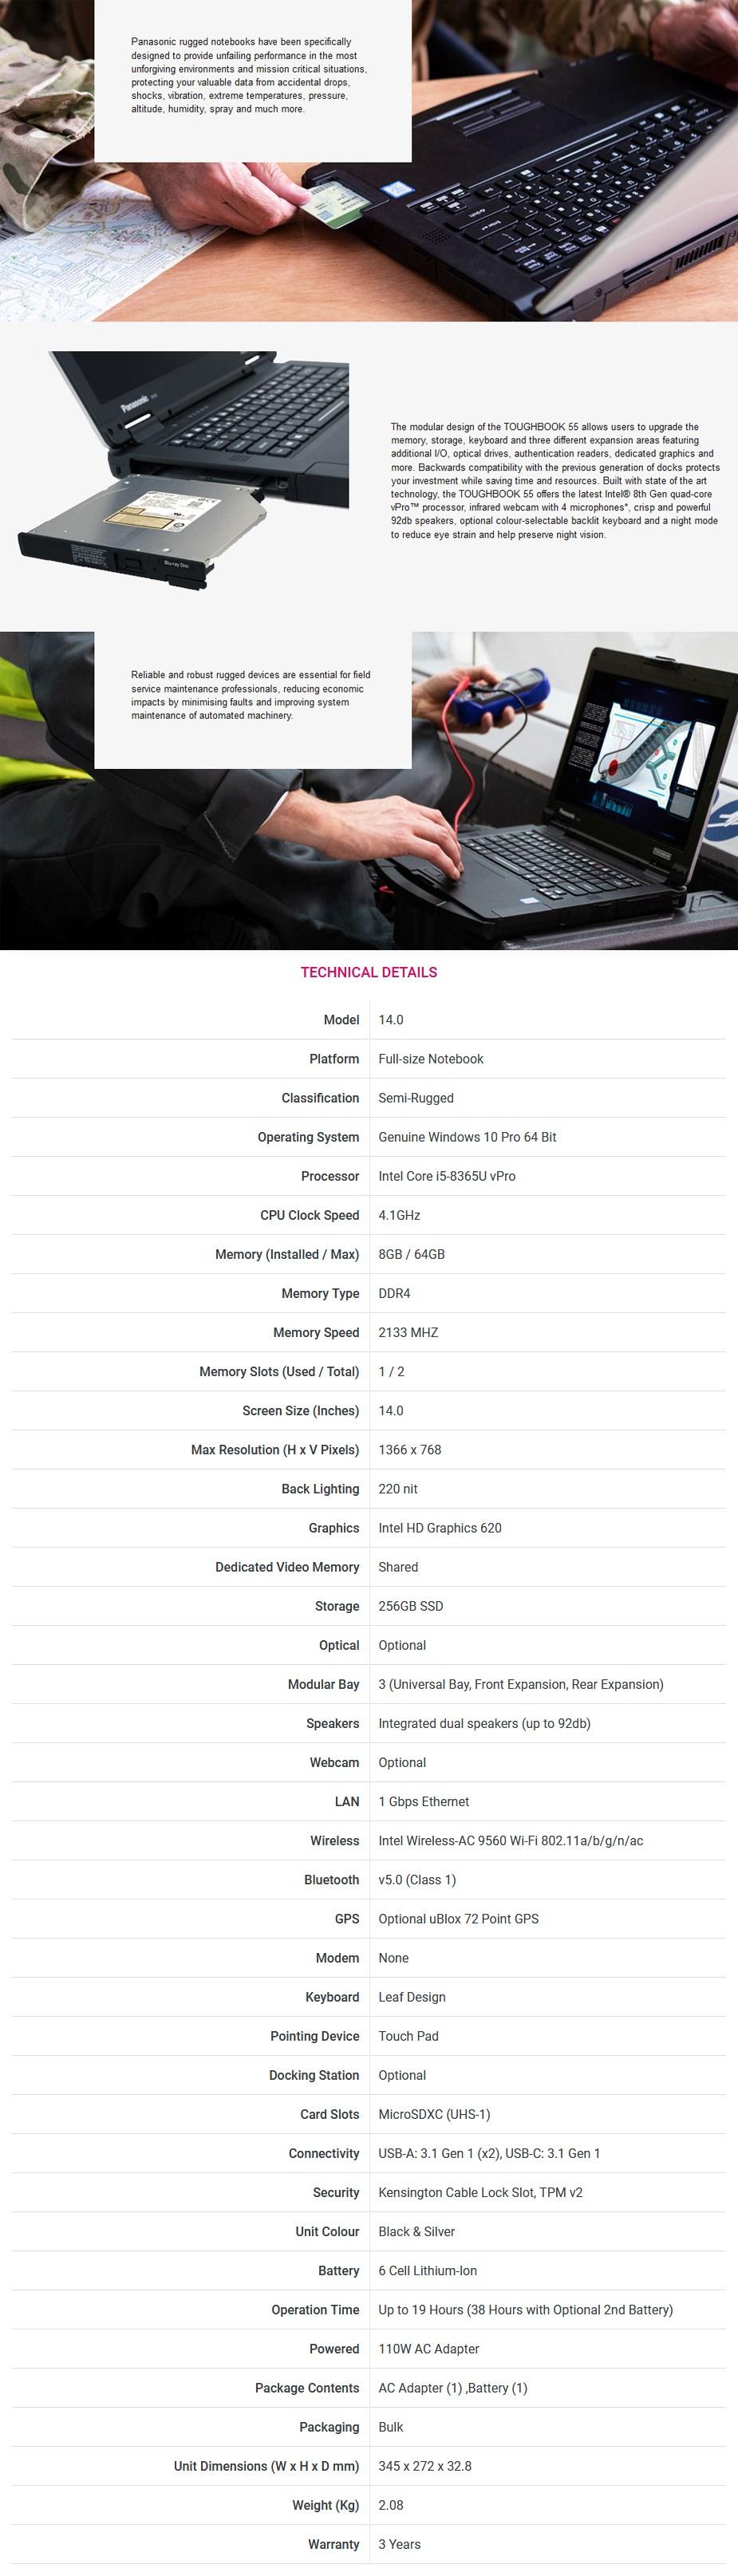 "Panasonic Toughbook MK1 FZ-55 14"" HD Laptop i5-8365U vPro 8GB 256GB W10P - Overview 1"